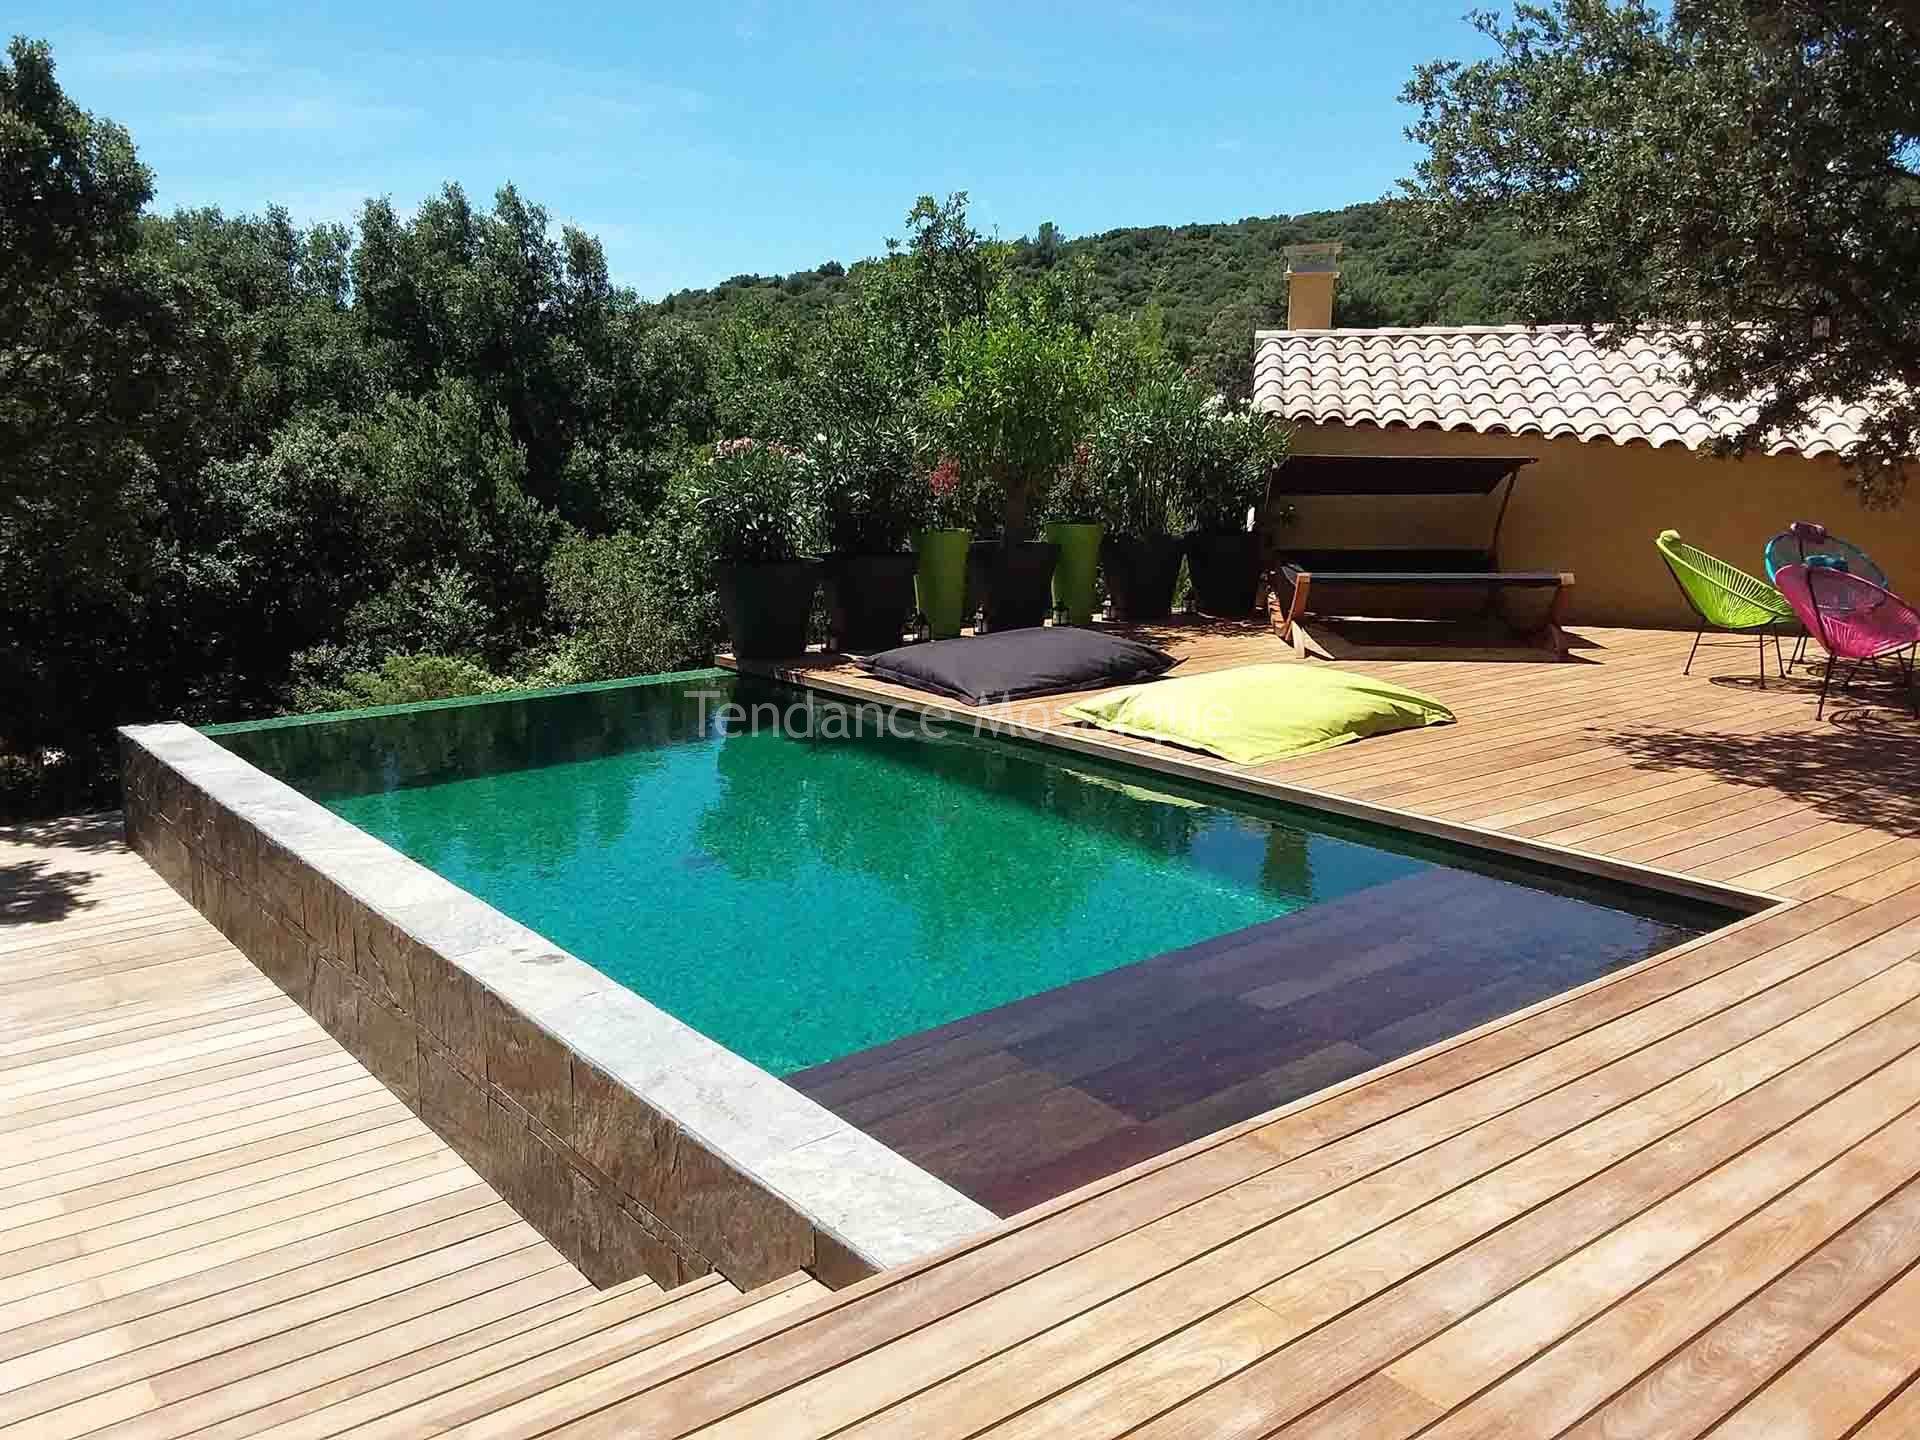 piscine en p te de verre dolce mosaic r f rence amazon. Black Bedroom Furniture Sets. Home Design Ideas